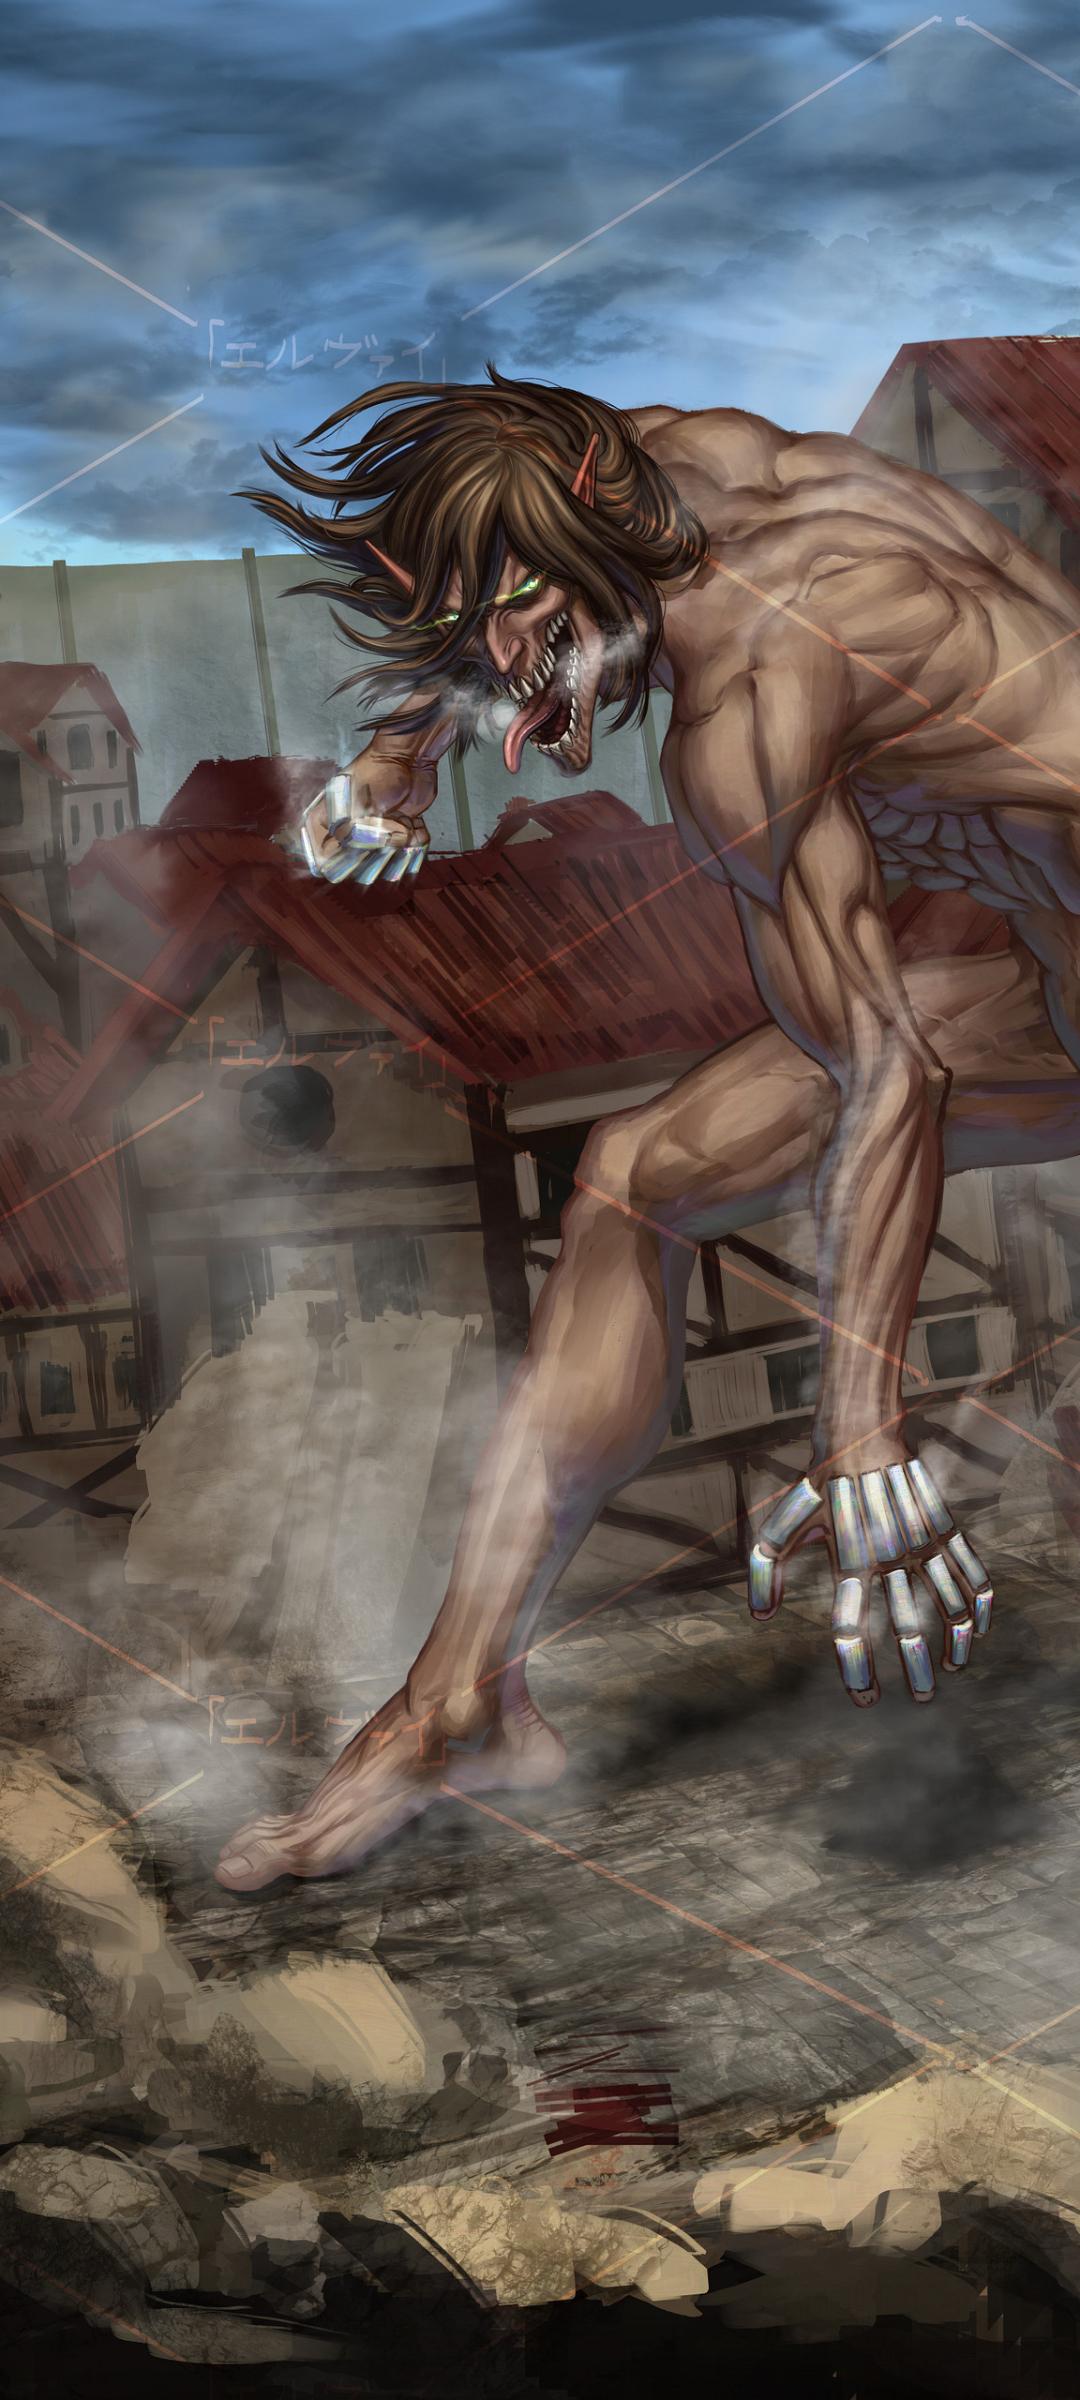 Anime Attack On Titan Hd Wallpaper